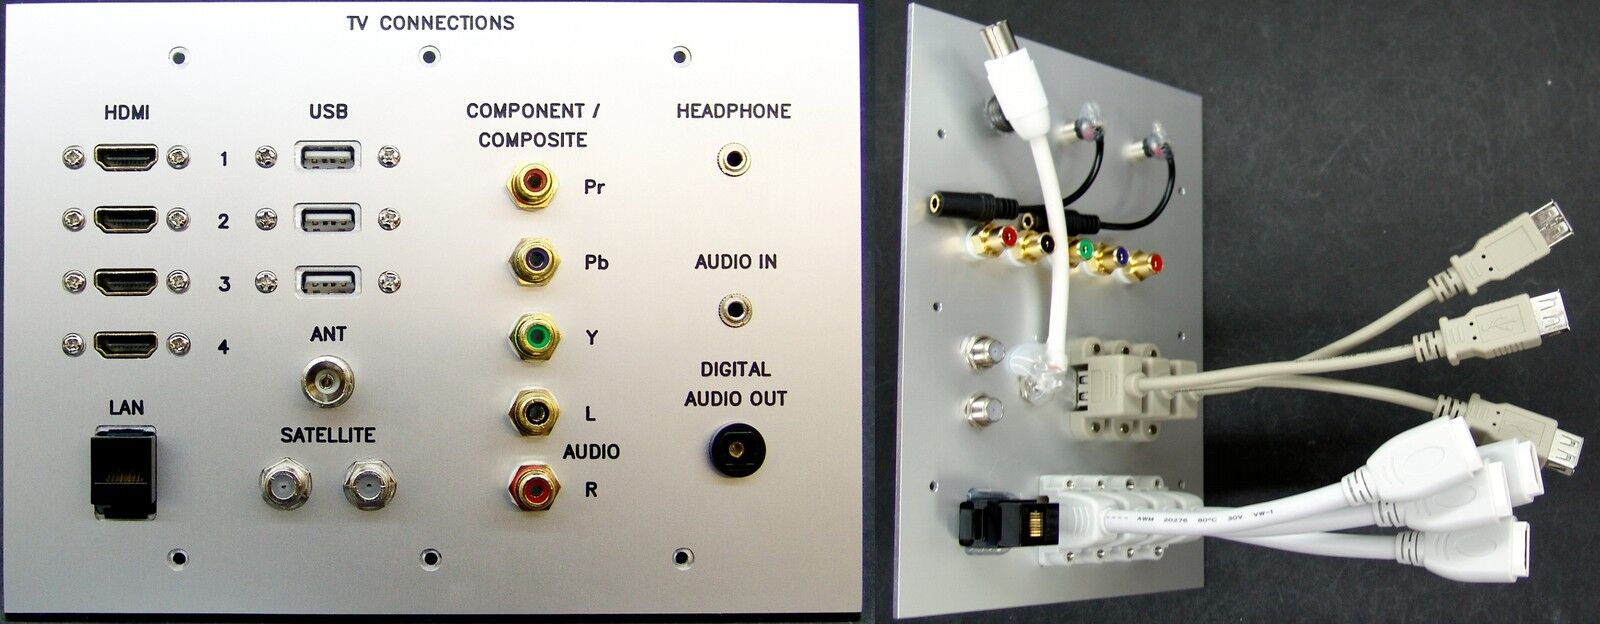 AV TV Metal Wall Plate HDMI/USB/Cat6/Composite/Jack/RF/Optical Audio tail-leads